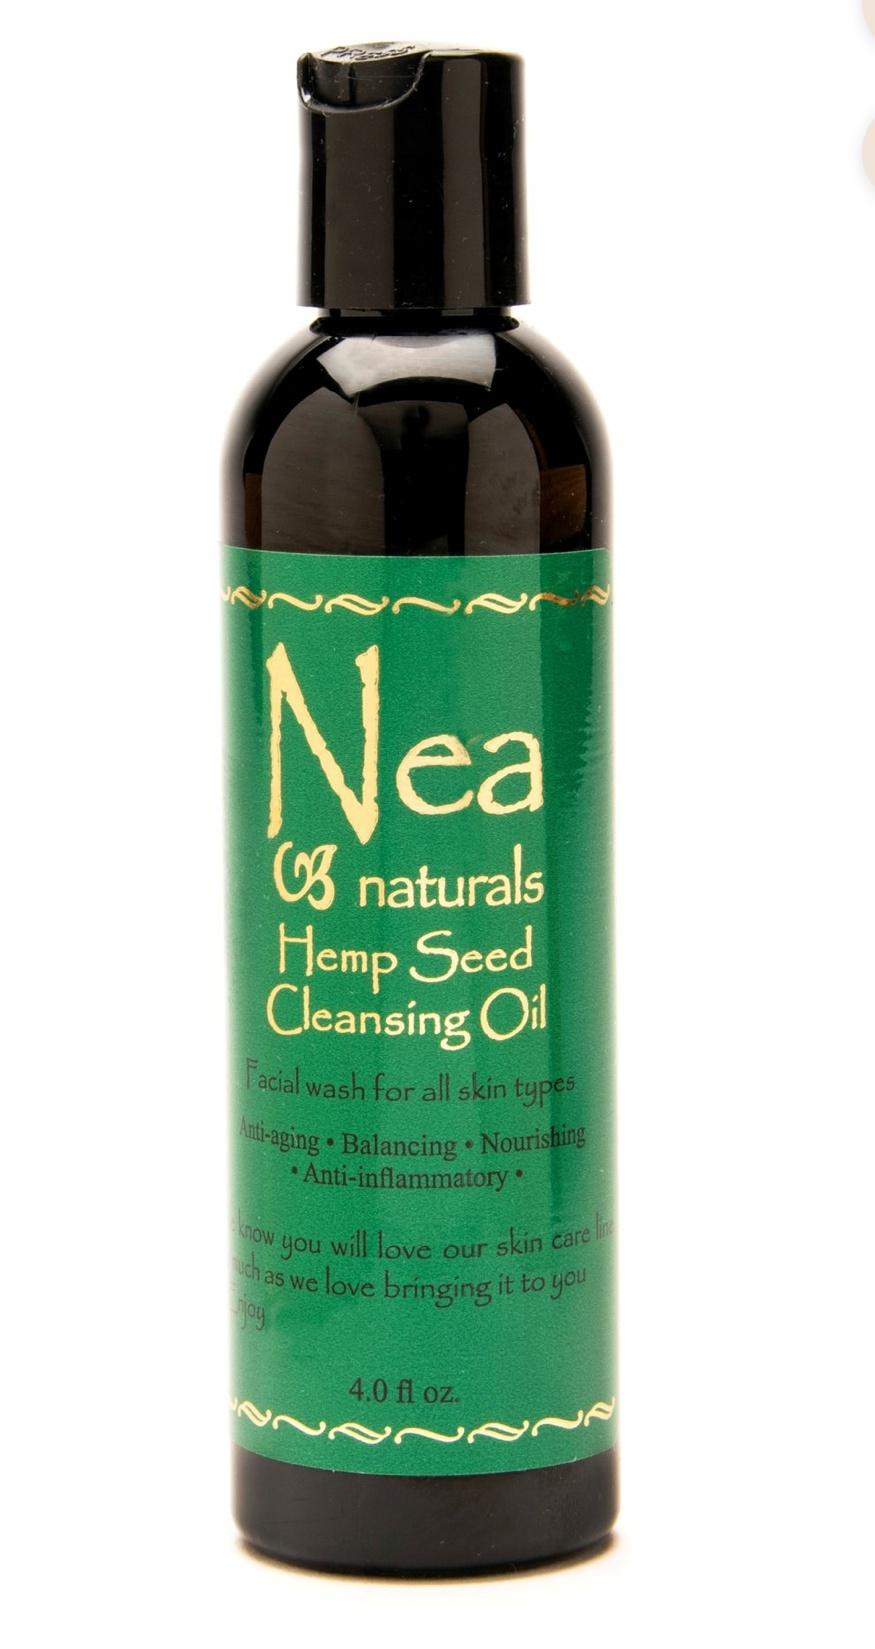 Nea Naturals Hemp Seed Cleansing Oil